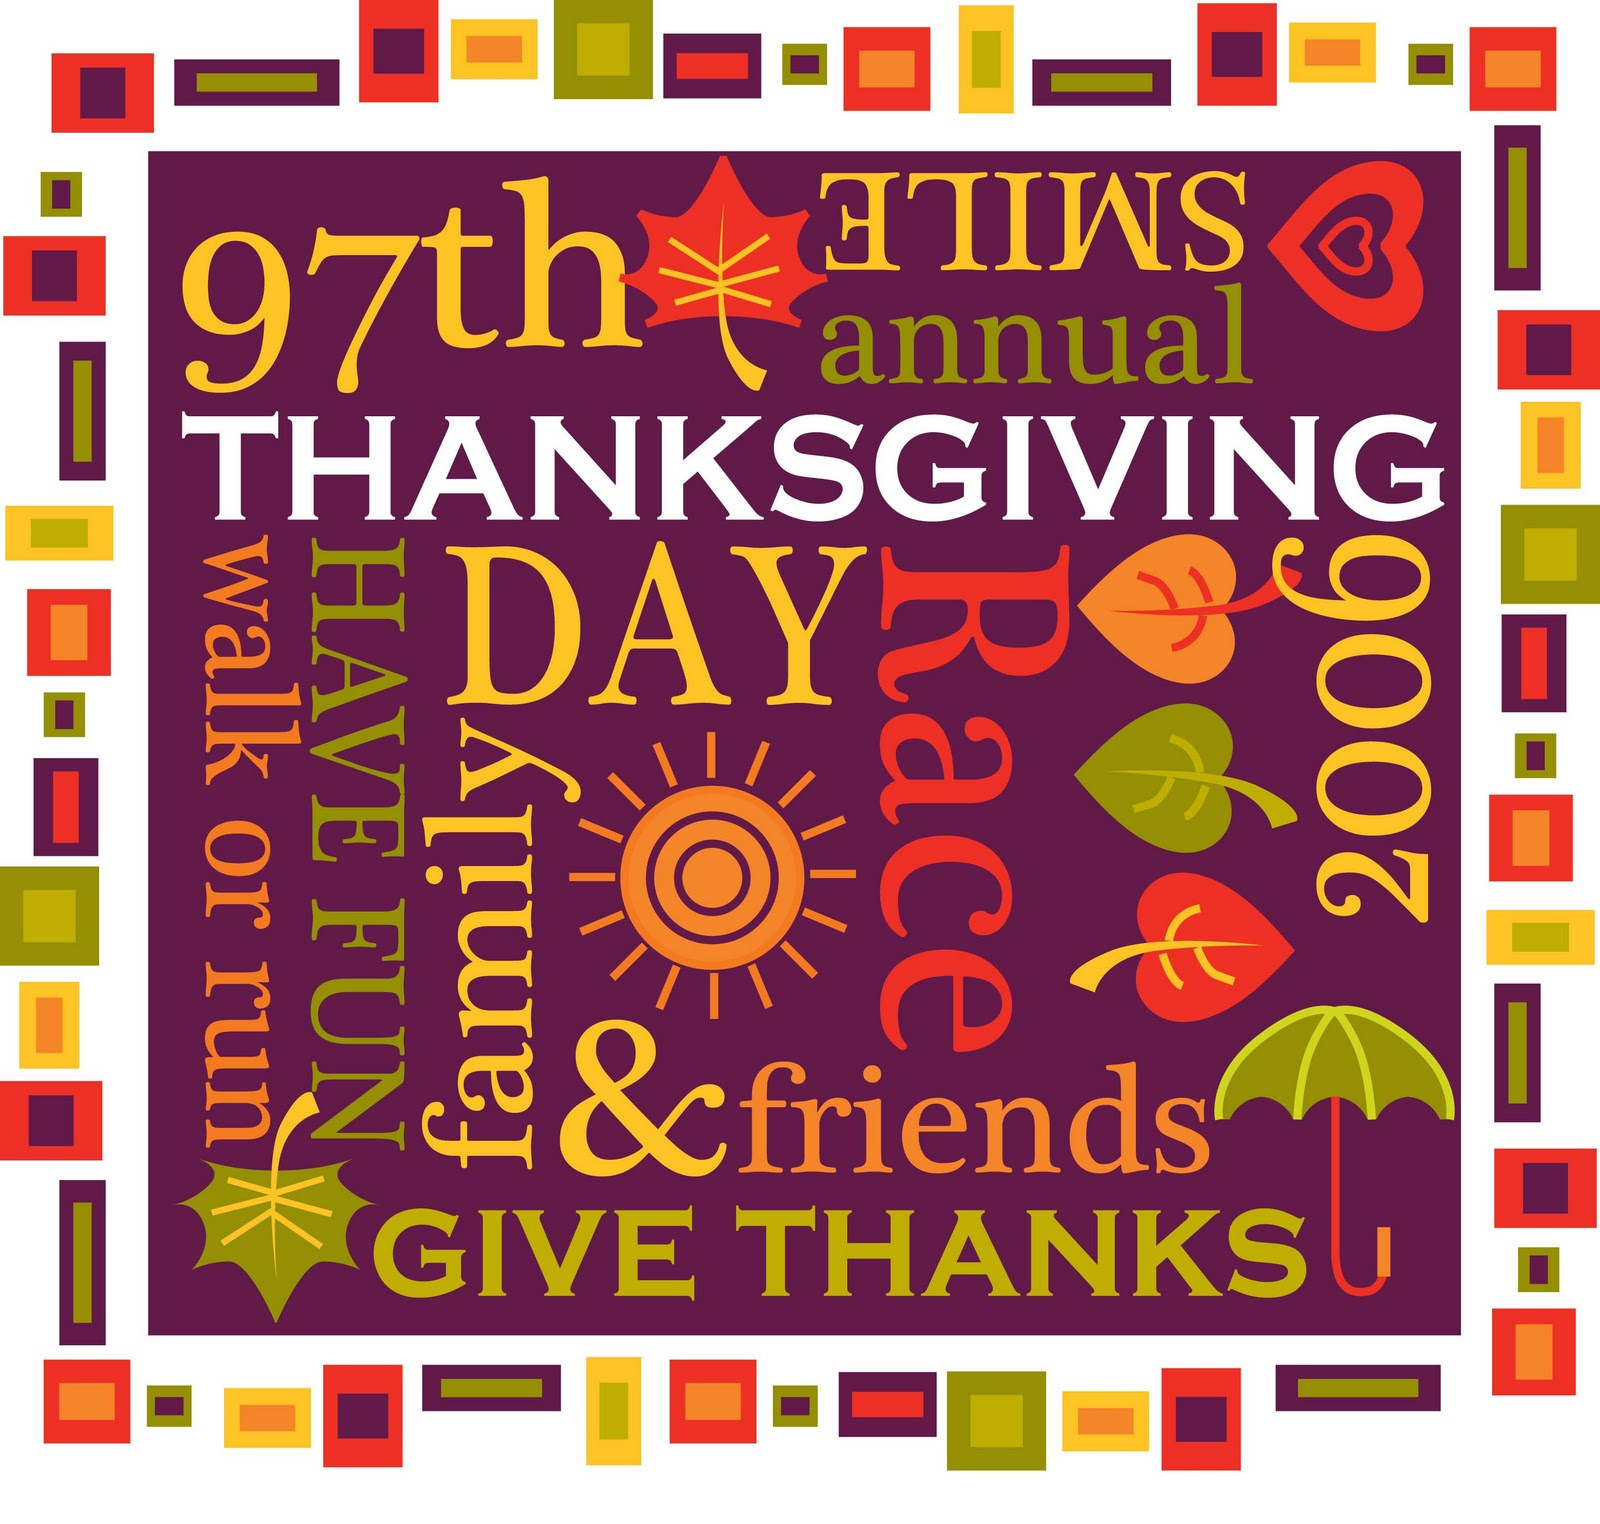 8th annual thanksgiving day - HD1600×1524